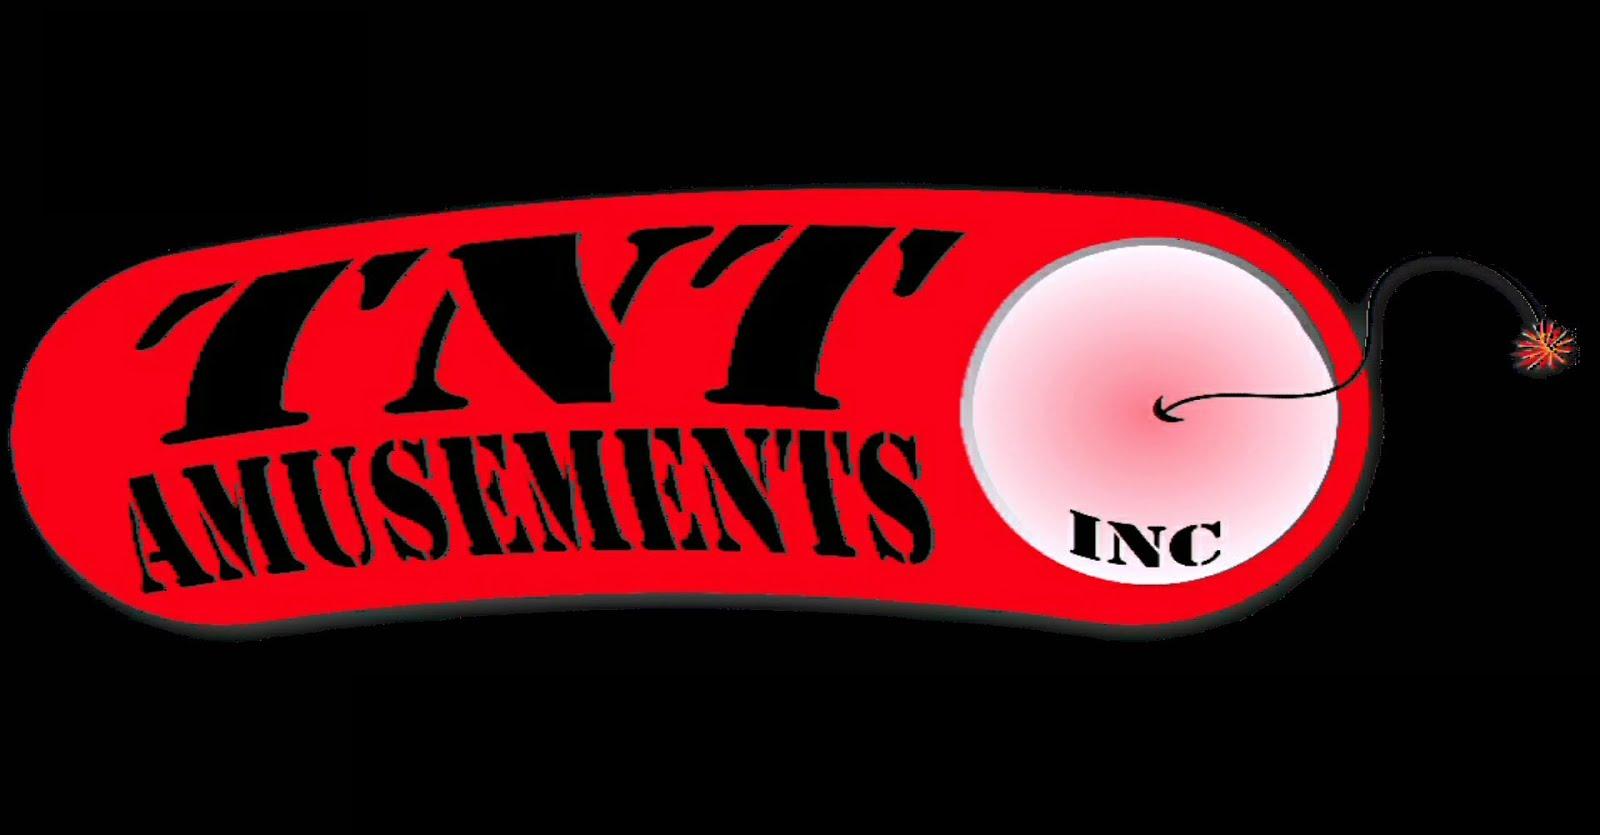 TNT Amusements Videos